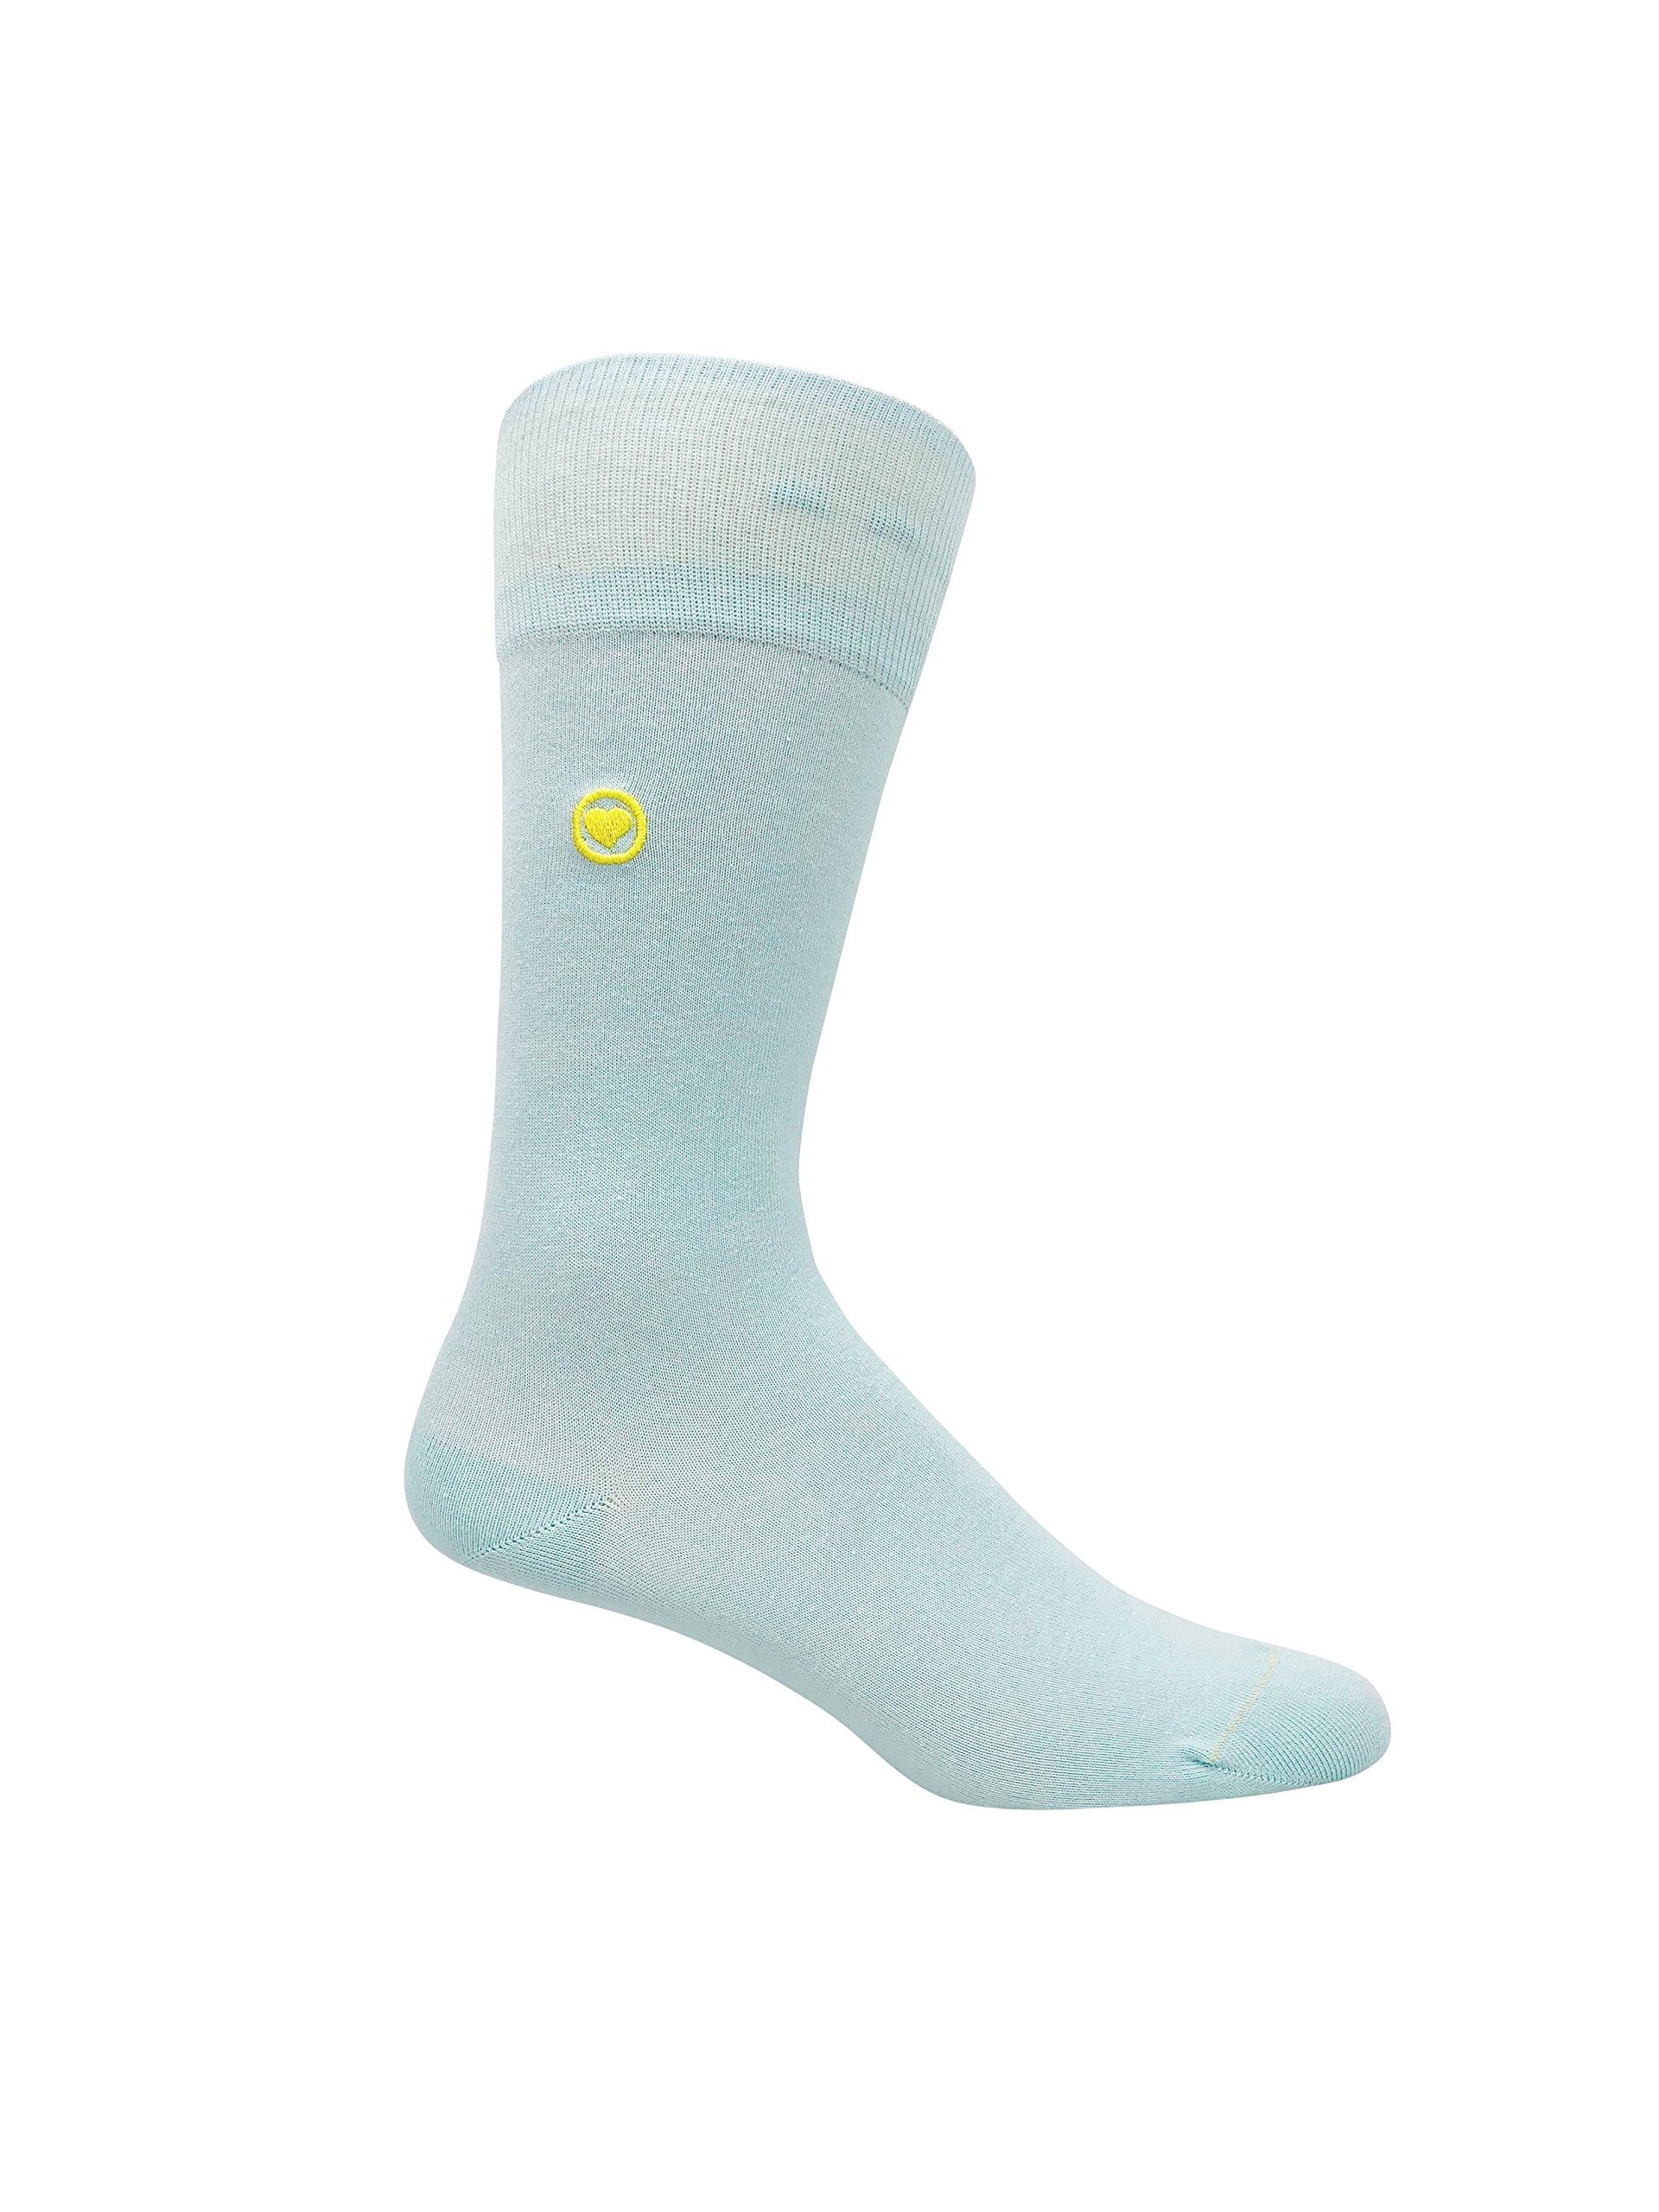 LOVE SOCK COMPANY Men's Blue dress socks. 98% organic cotton premium mens socks.